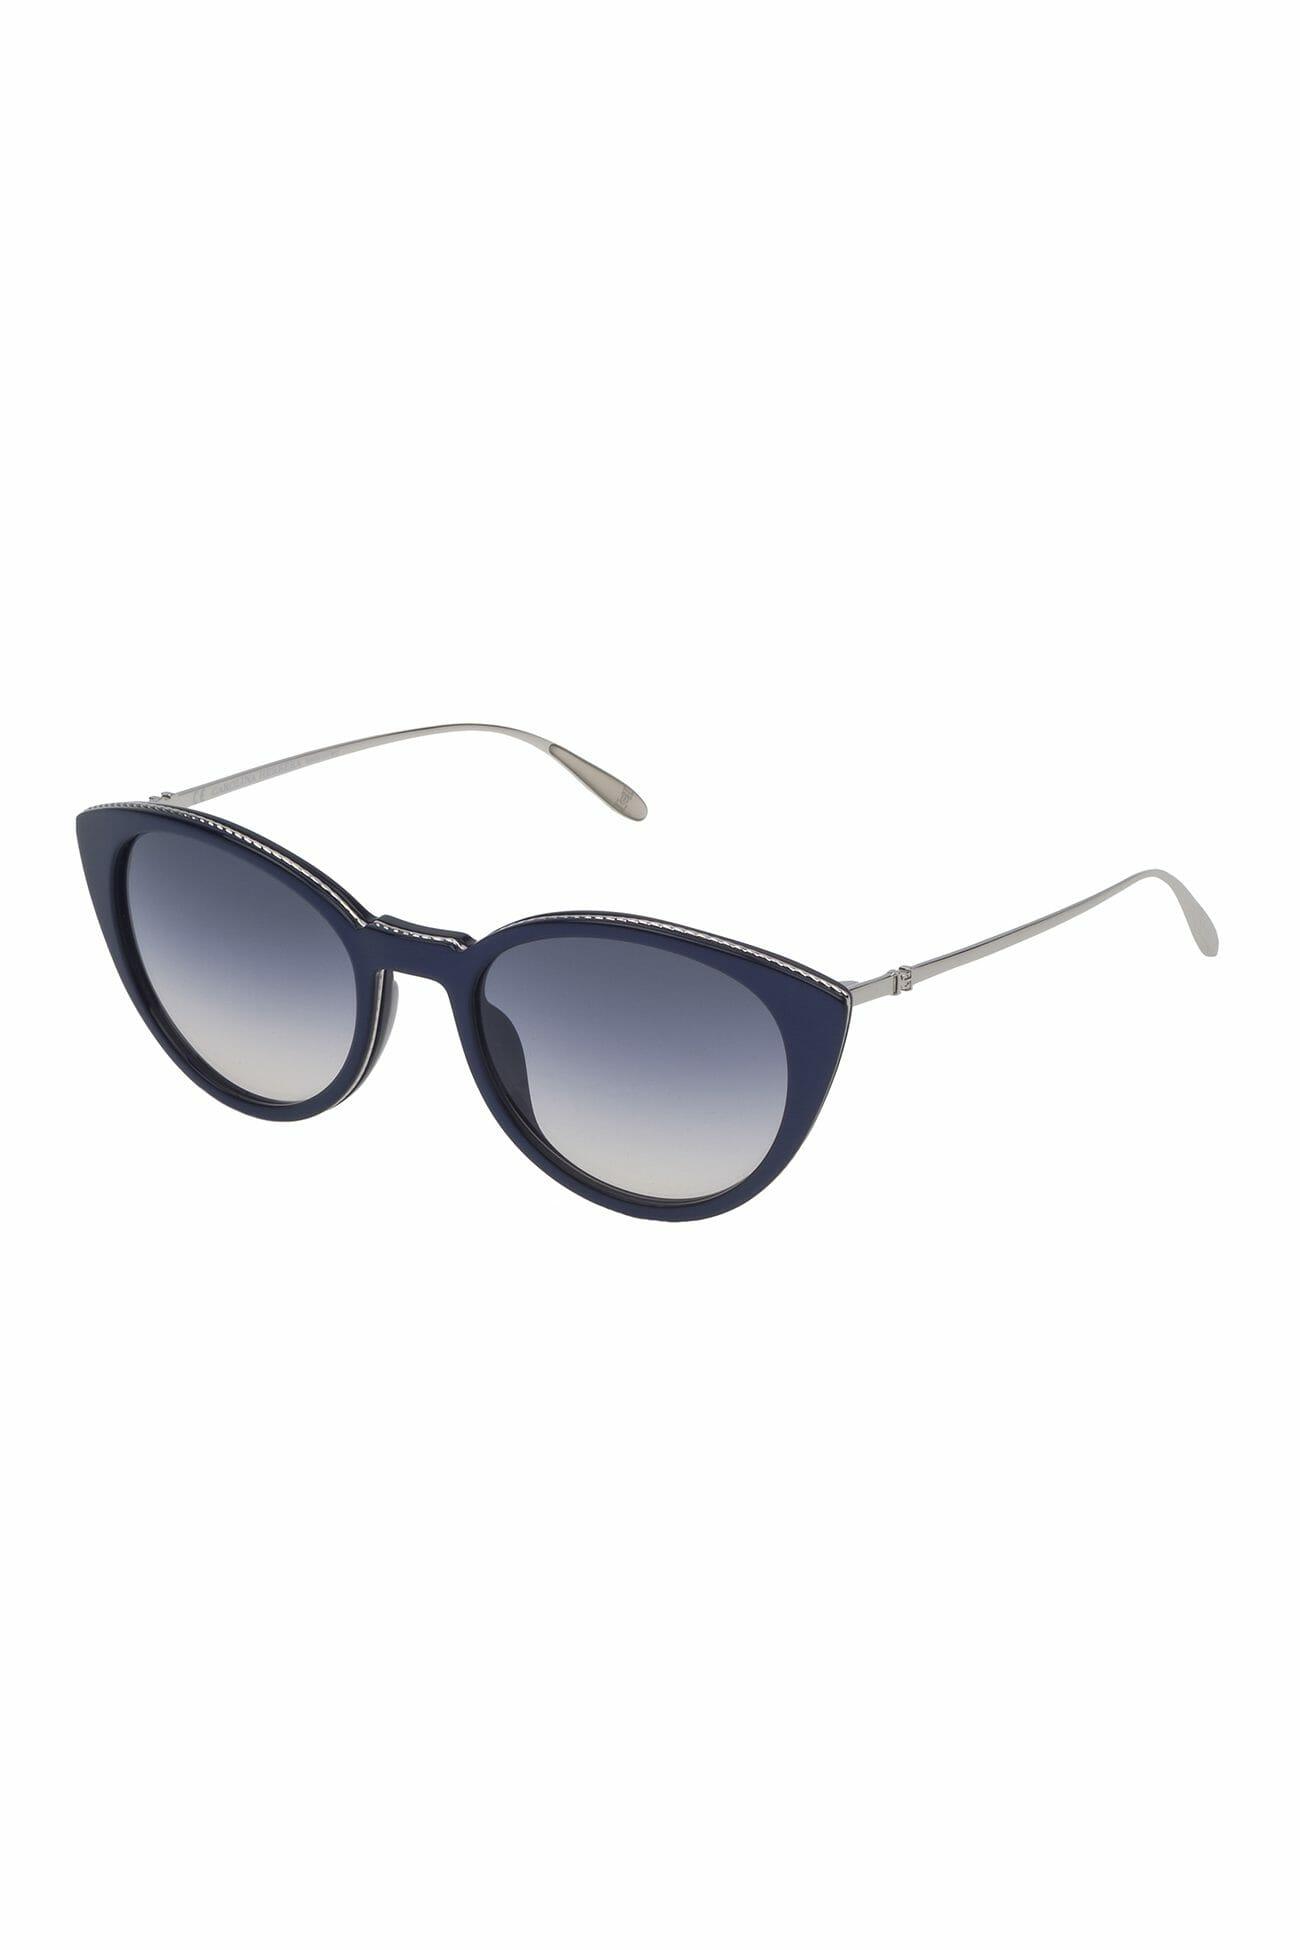 Carolina-Herrera-New-York-Eyewear-Reference2G2-01